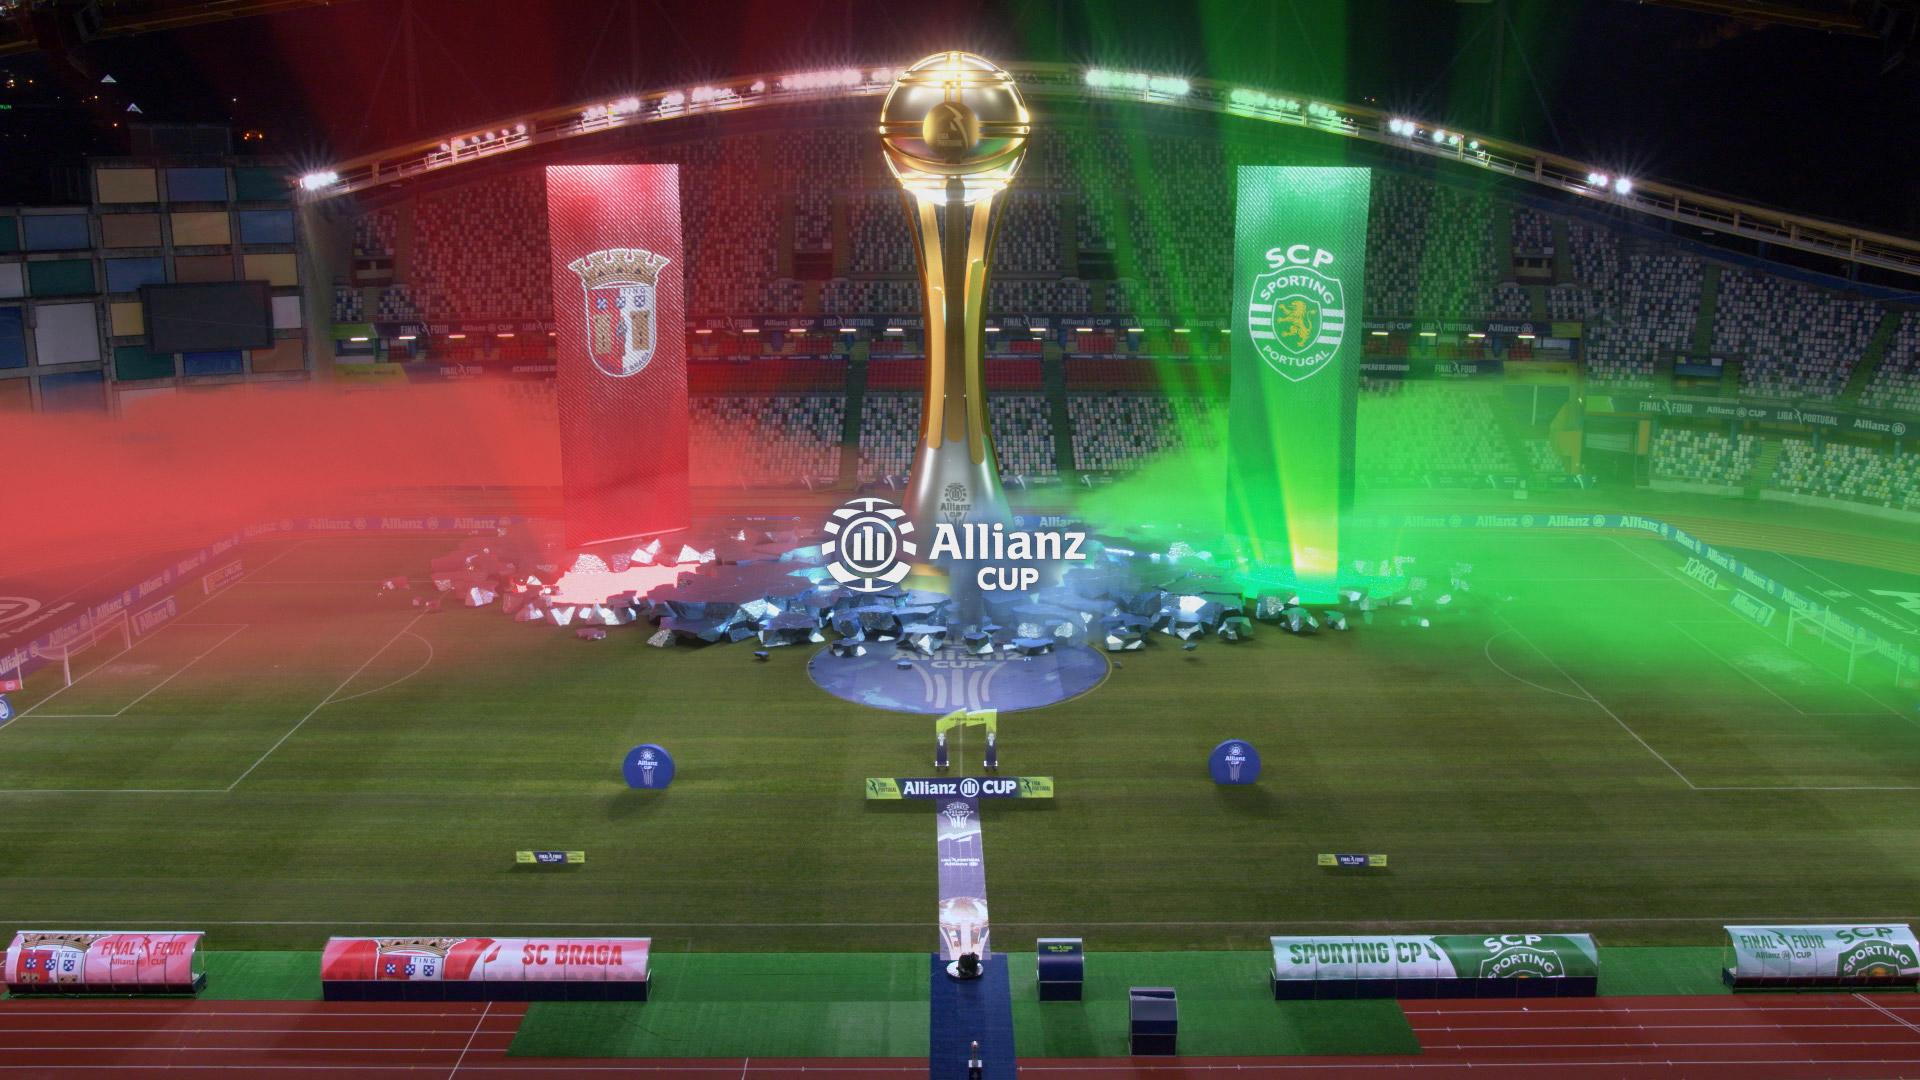 Allianz Cup 2021